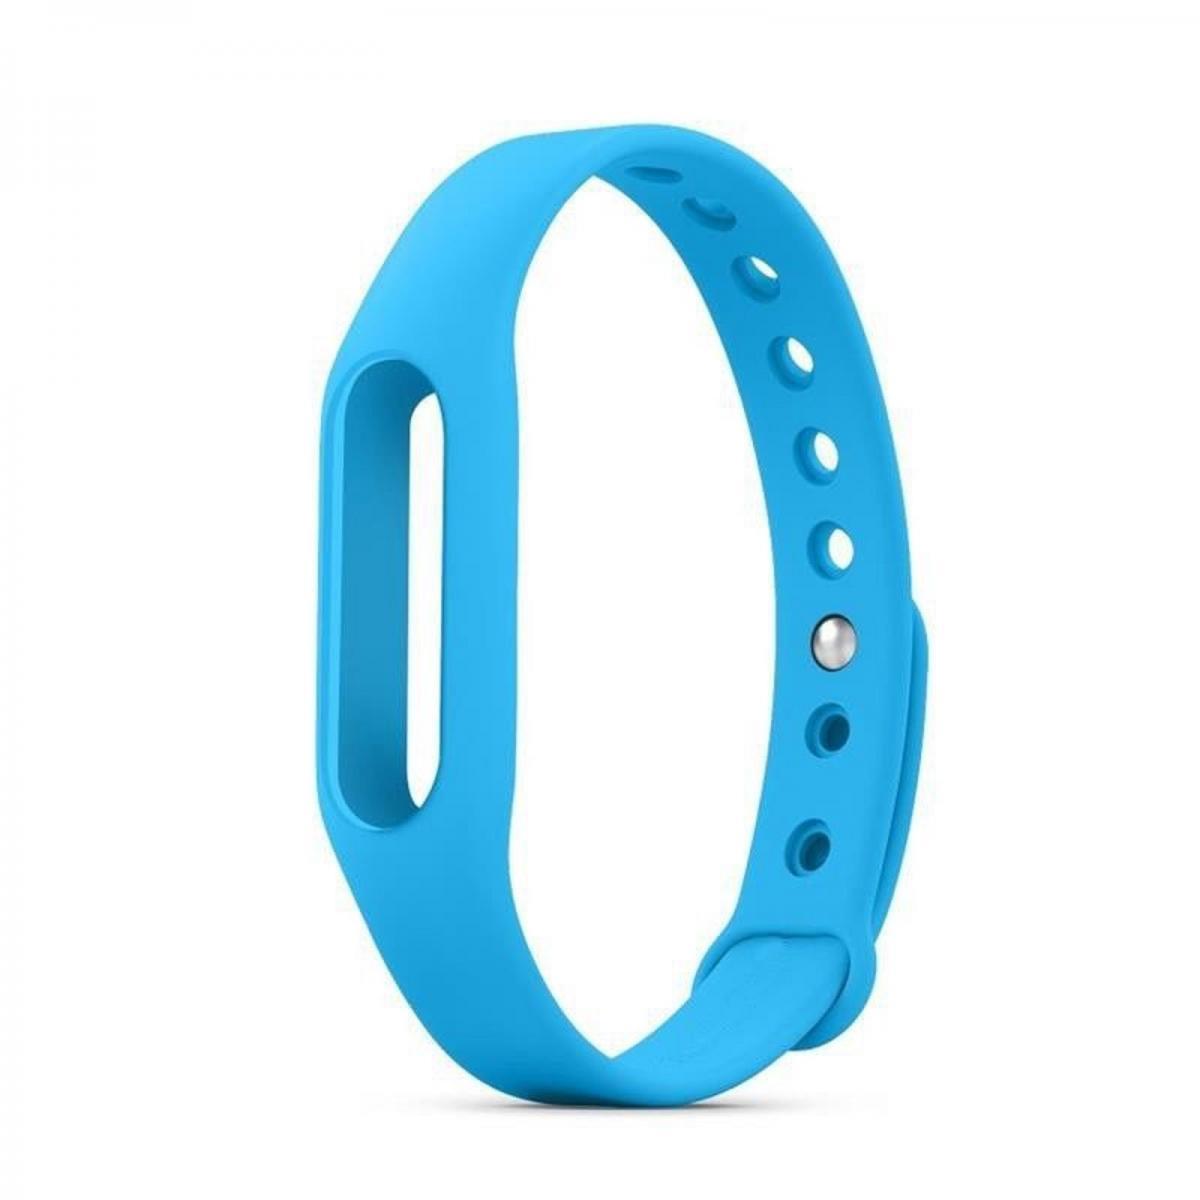 28994cd3436f Recambio de correa de silicona para pulsera reloj Xiaomi Mi Band 2 Color  Azul